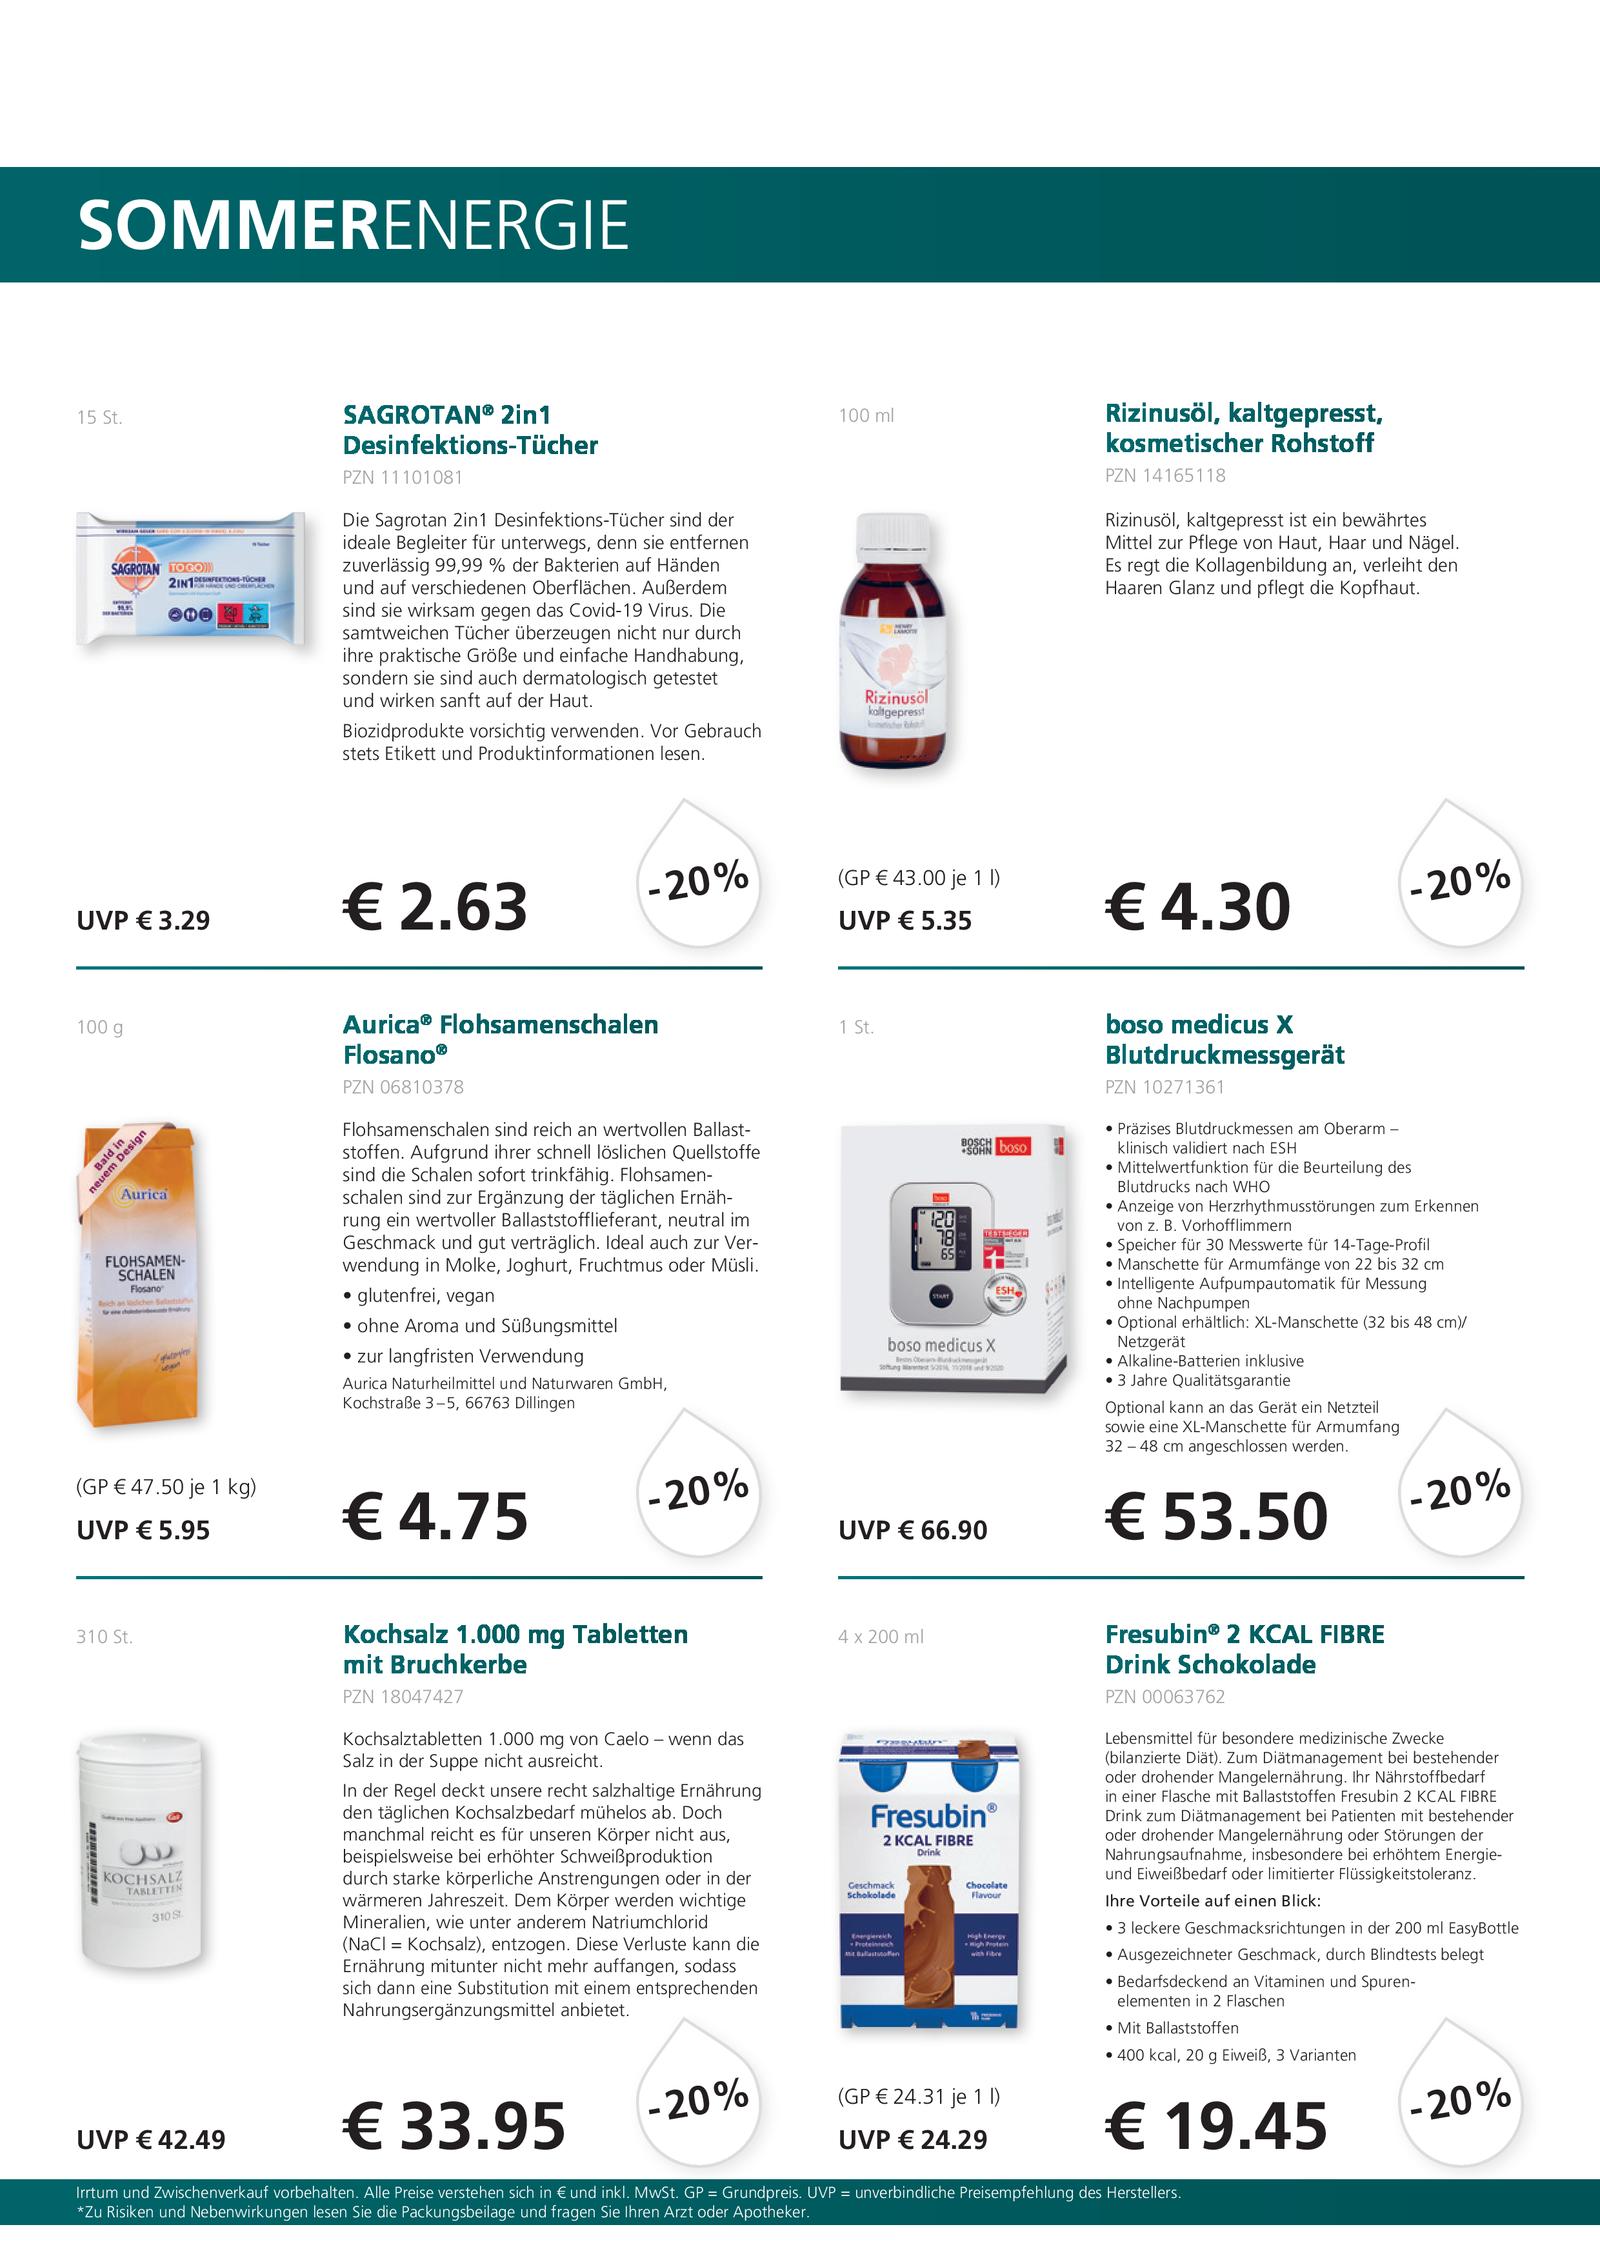 https://mein-uploads.apocdn.net/17664/leaflets/17664_flyer-Seite3.png